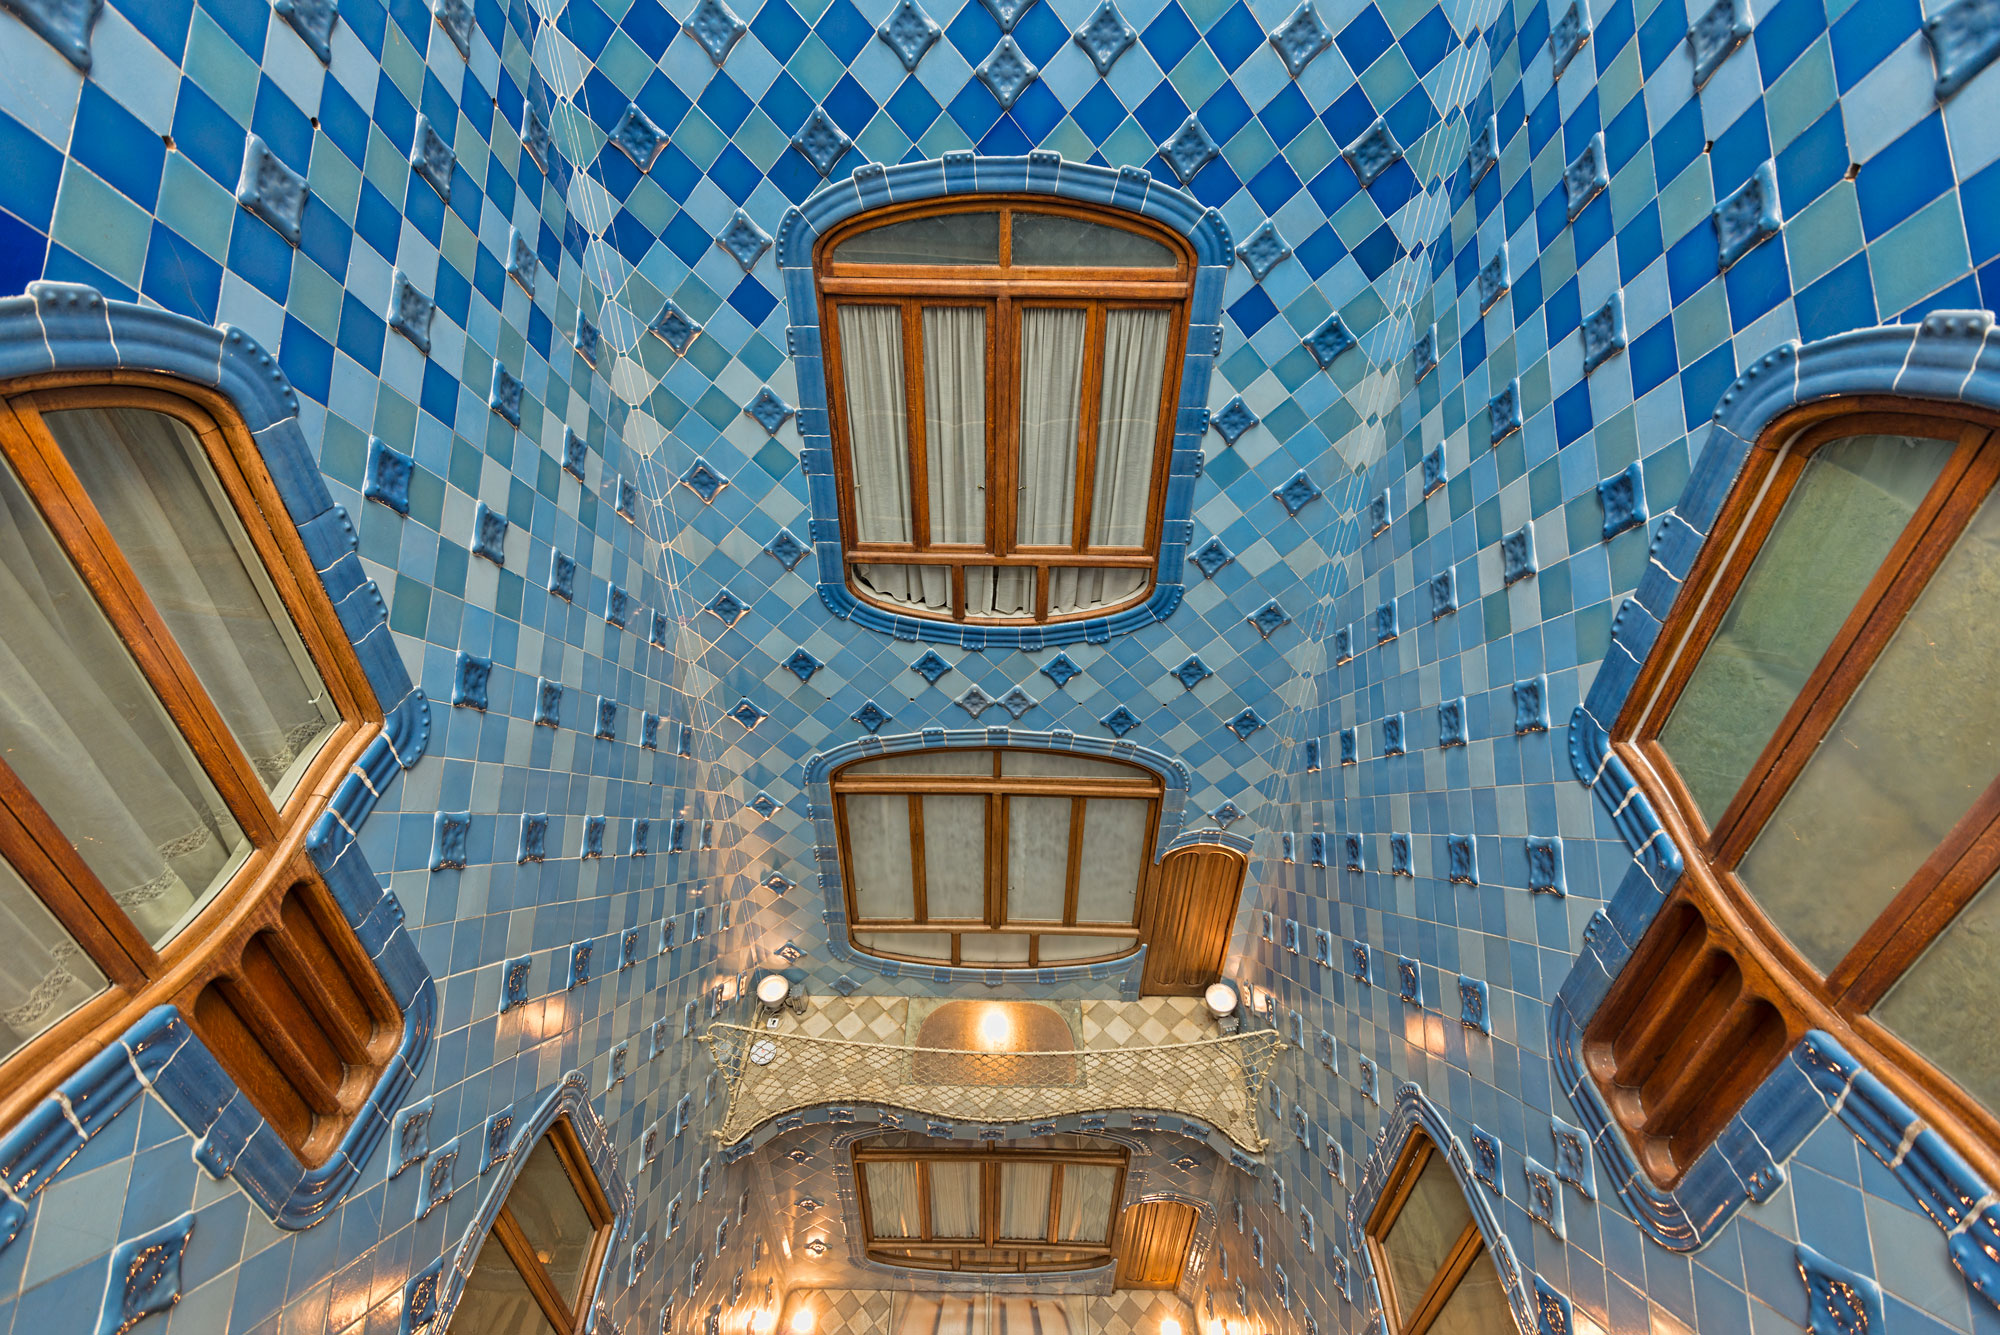 A peek inside Gaudi's Casa Batlló